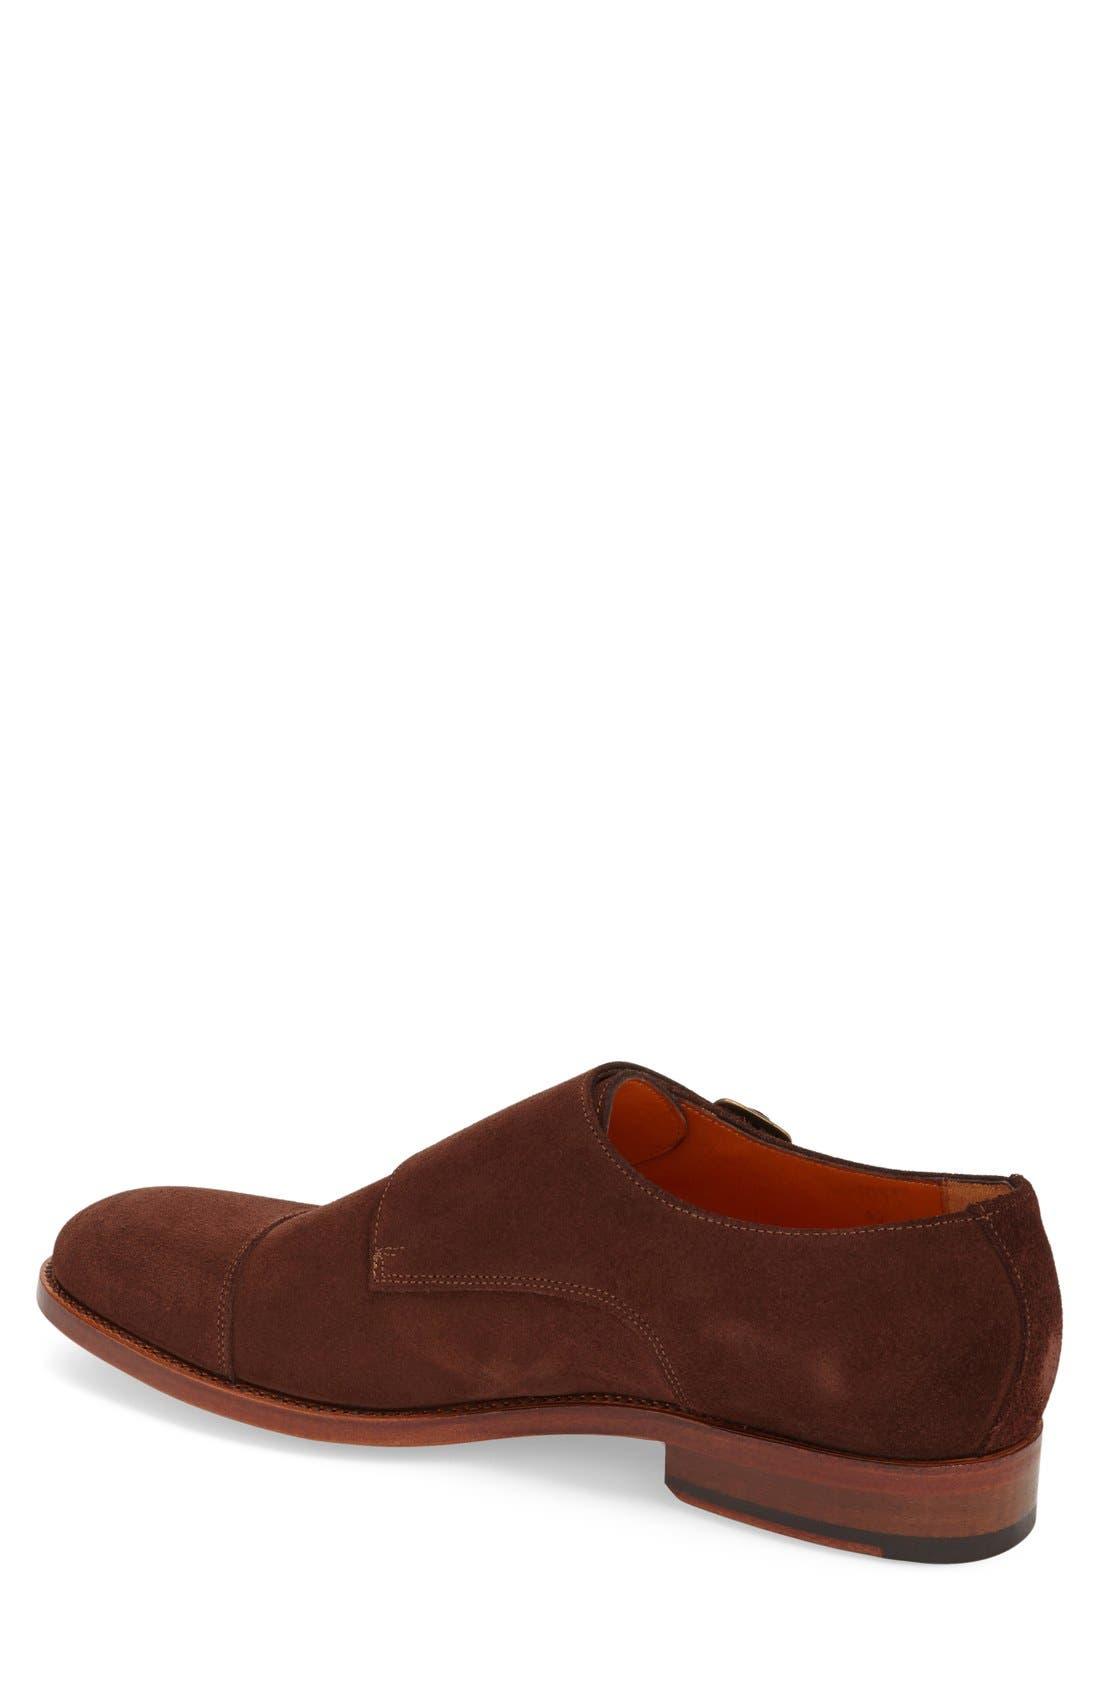 Alternate Image 2  - Crosby Square 'Diplomat' Double Monk Strap Shoe (Men)